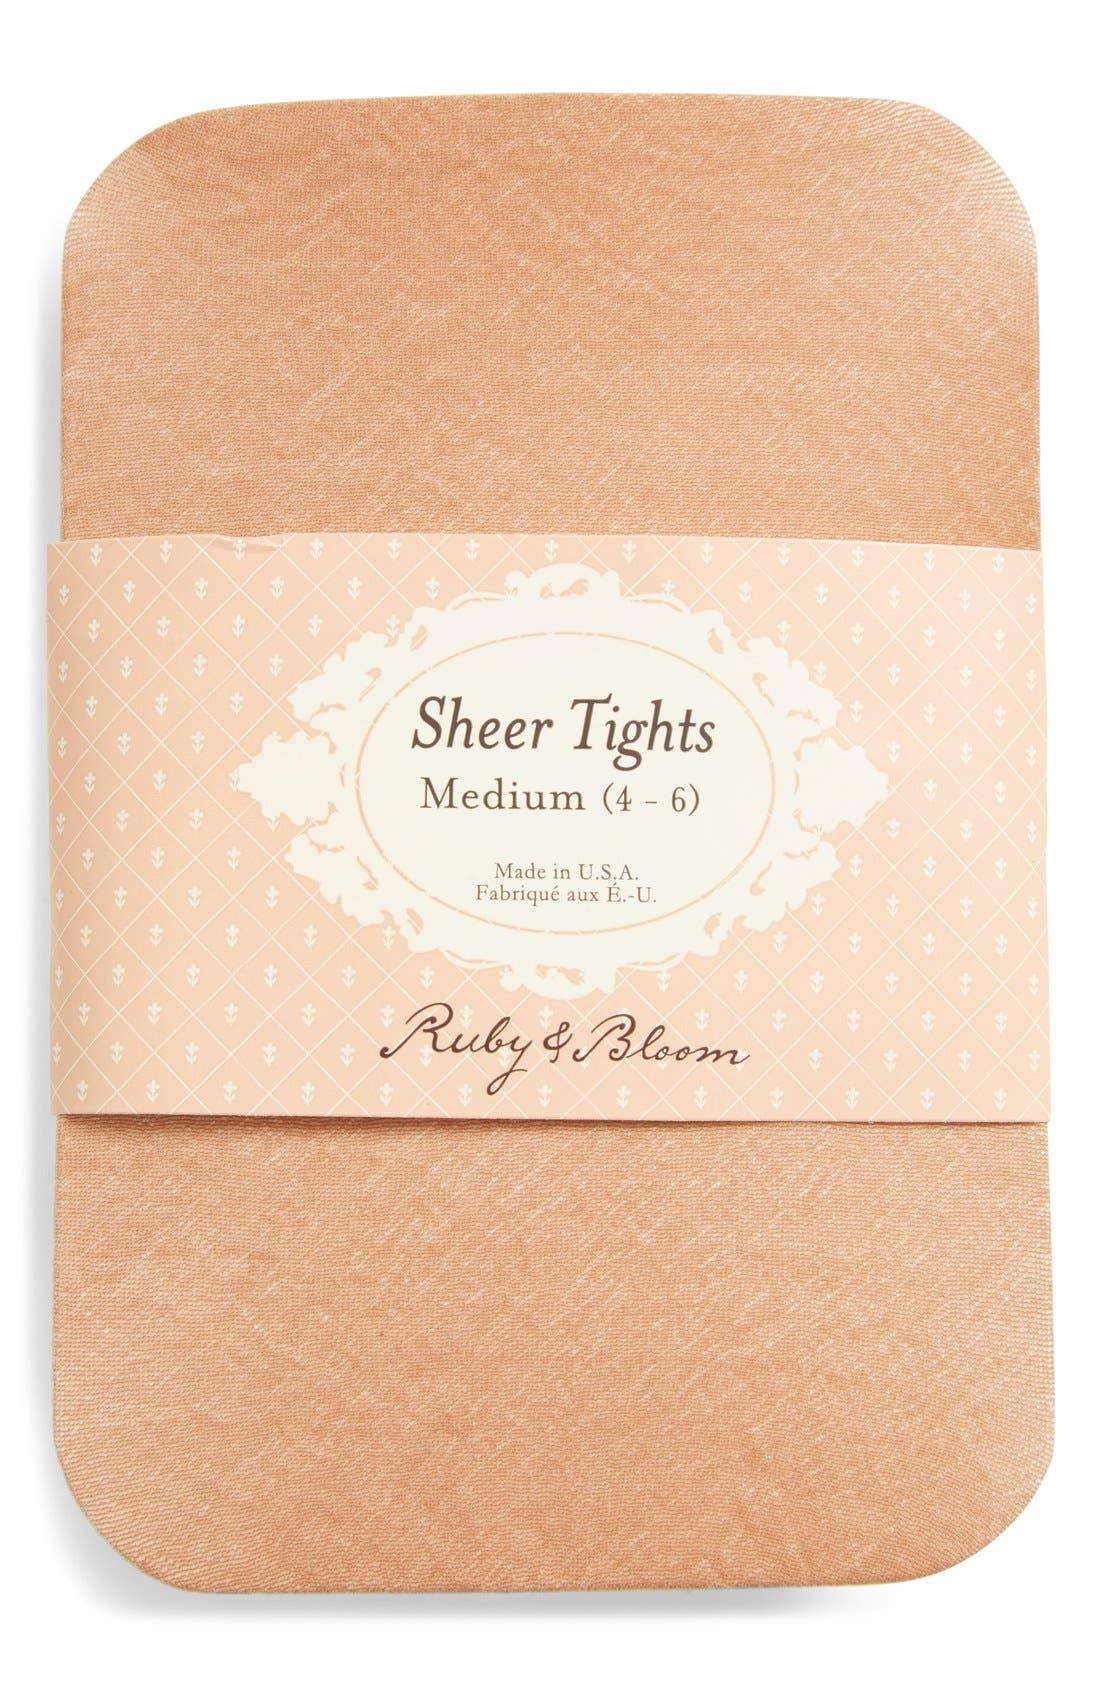 Alternate Image 2  - Ruby & Bloom Sheer Tights (Toddler Girls, Little Girls & Big Girls) (2 for $12)